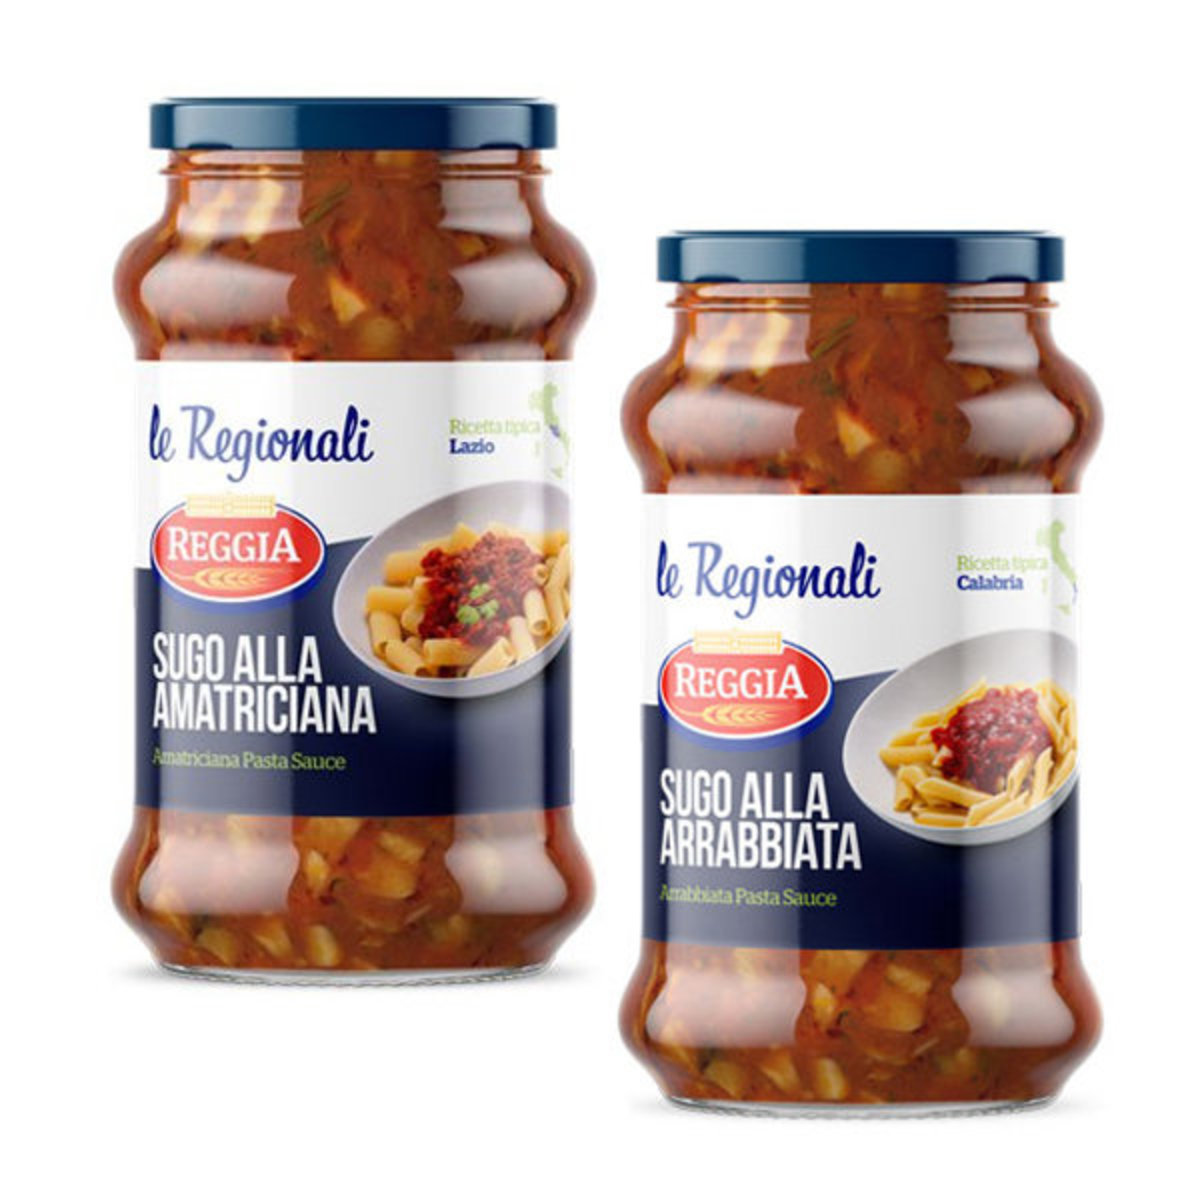 Arrabbiata x Amatriciana (350g) x2 Bottle Italian Reggia Pasta Sauce 香辣茄醬 x 蕃茄培根醬